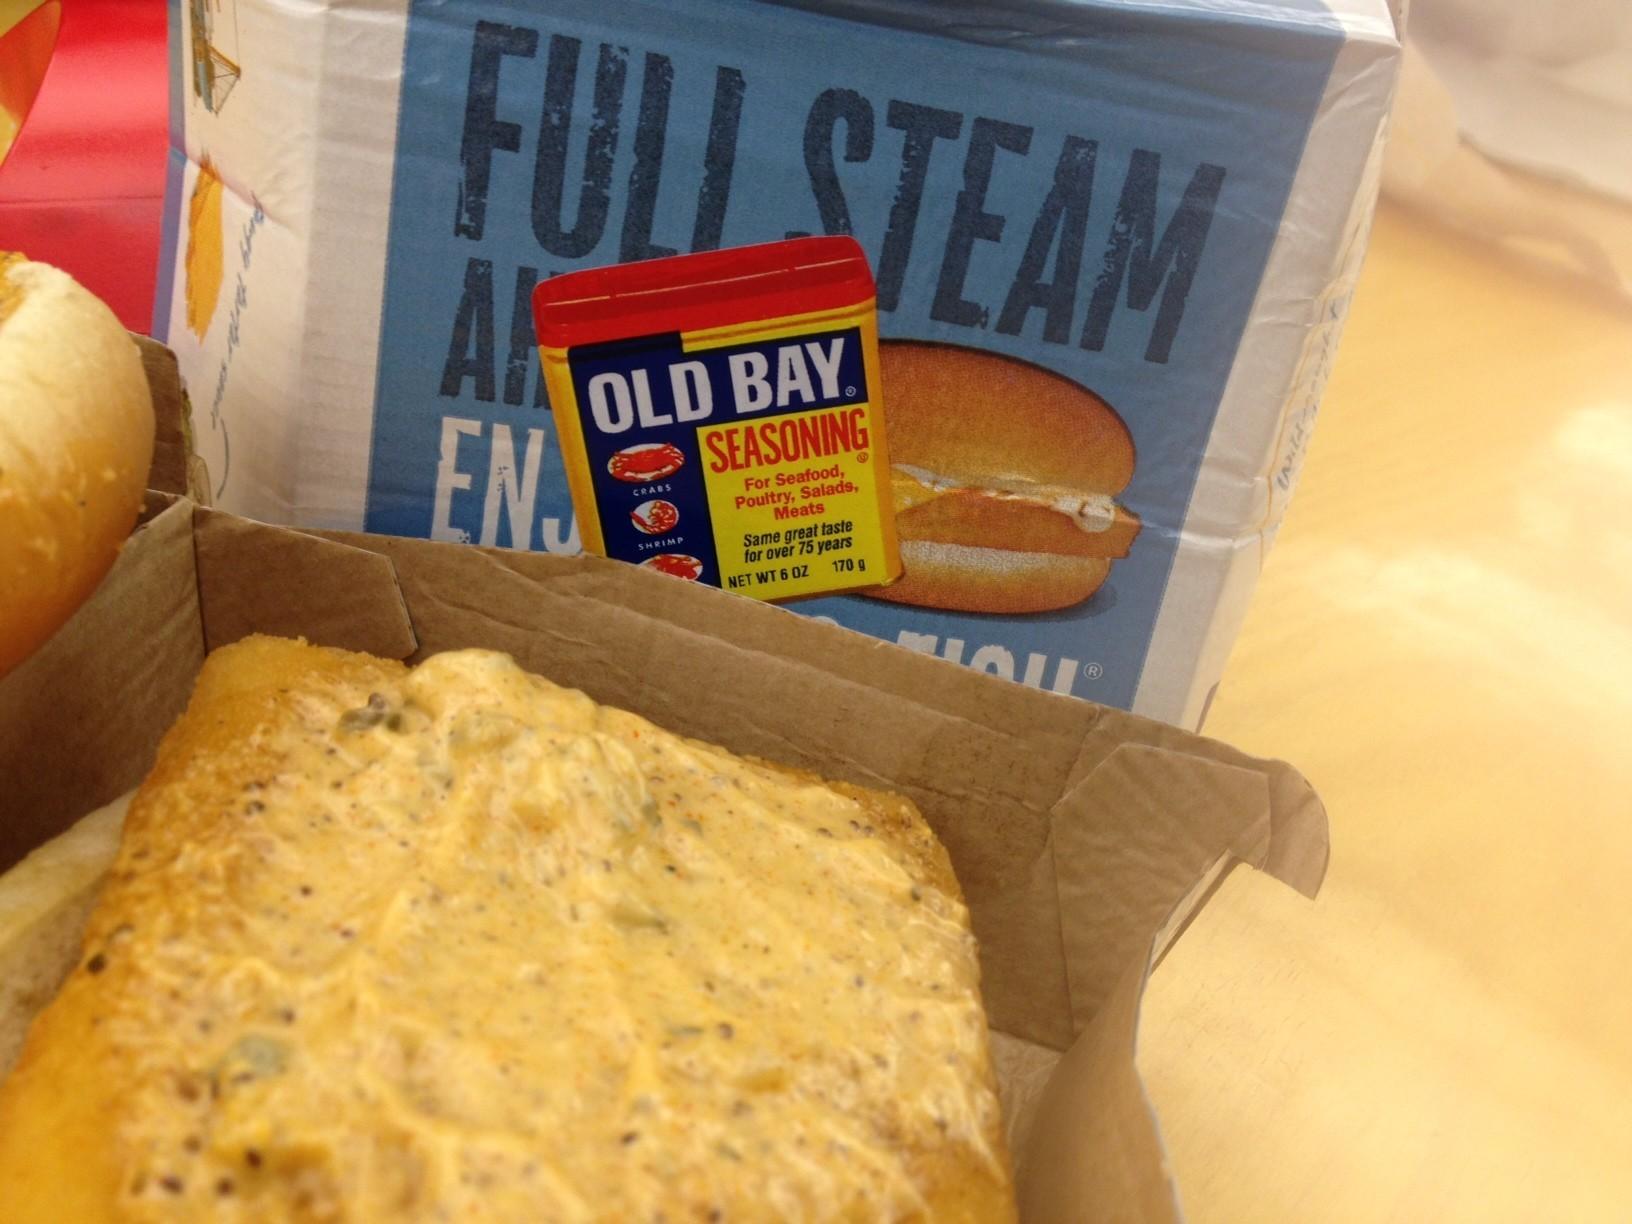 We try the old bay filet o fish at mcdonald 39 s daily press for Filet o fish